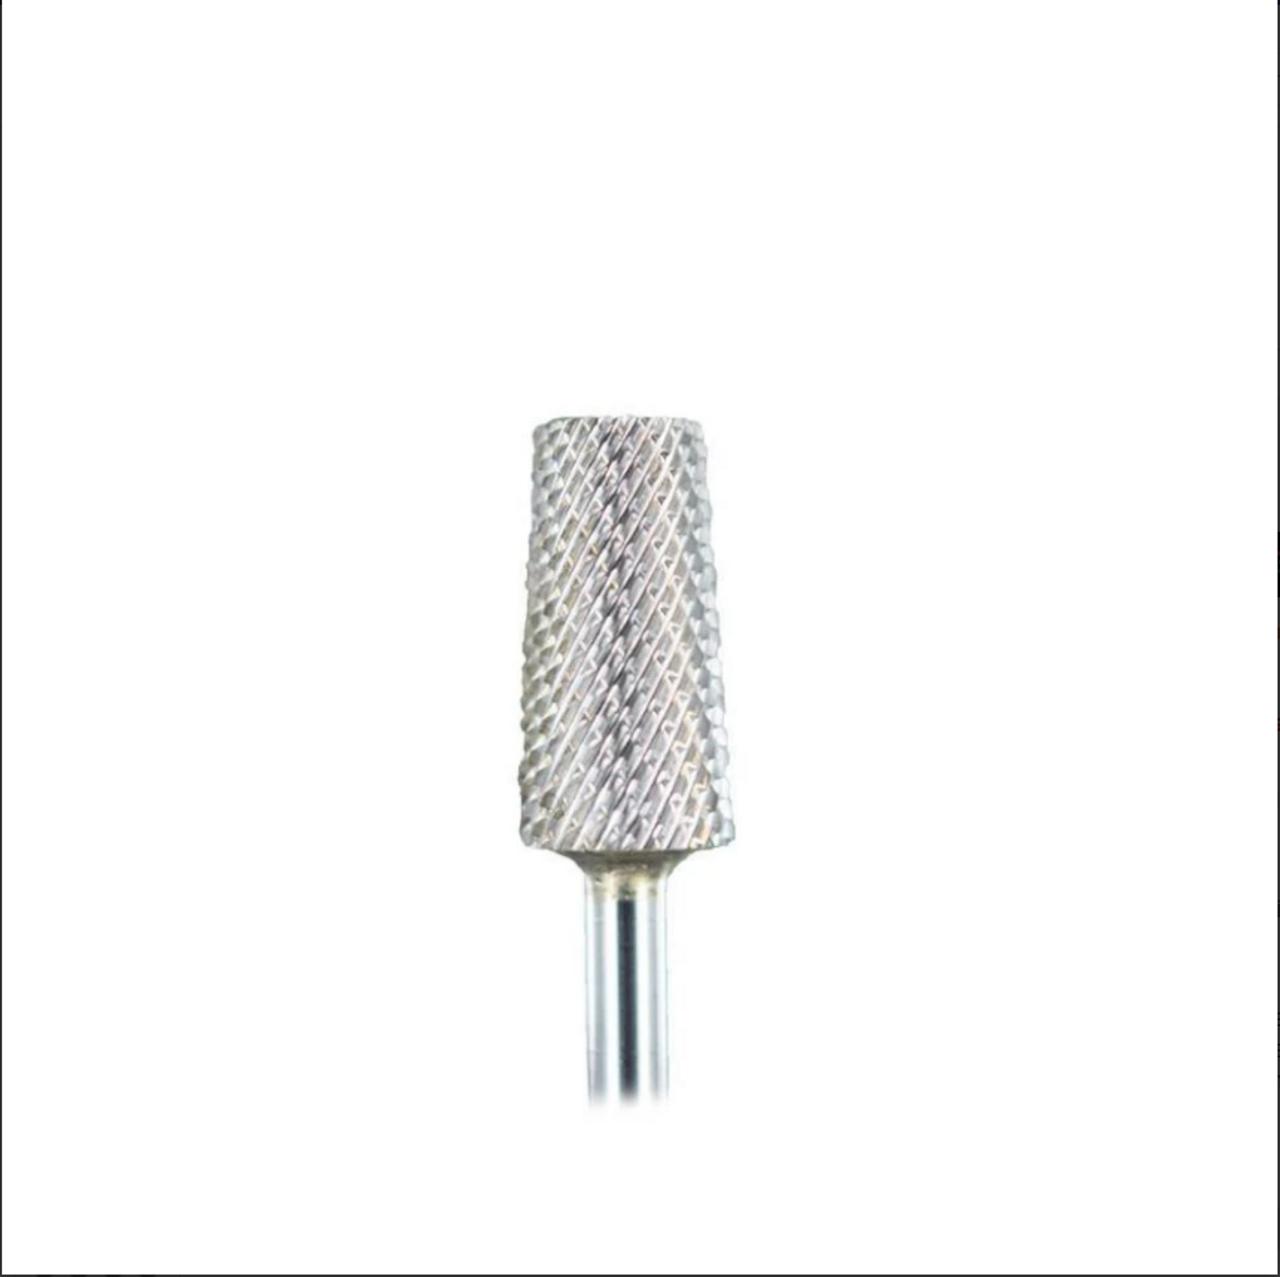 Tec Pro 3 in 1 Silver Carbide Bit, Medium